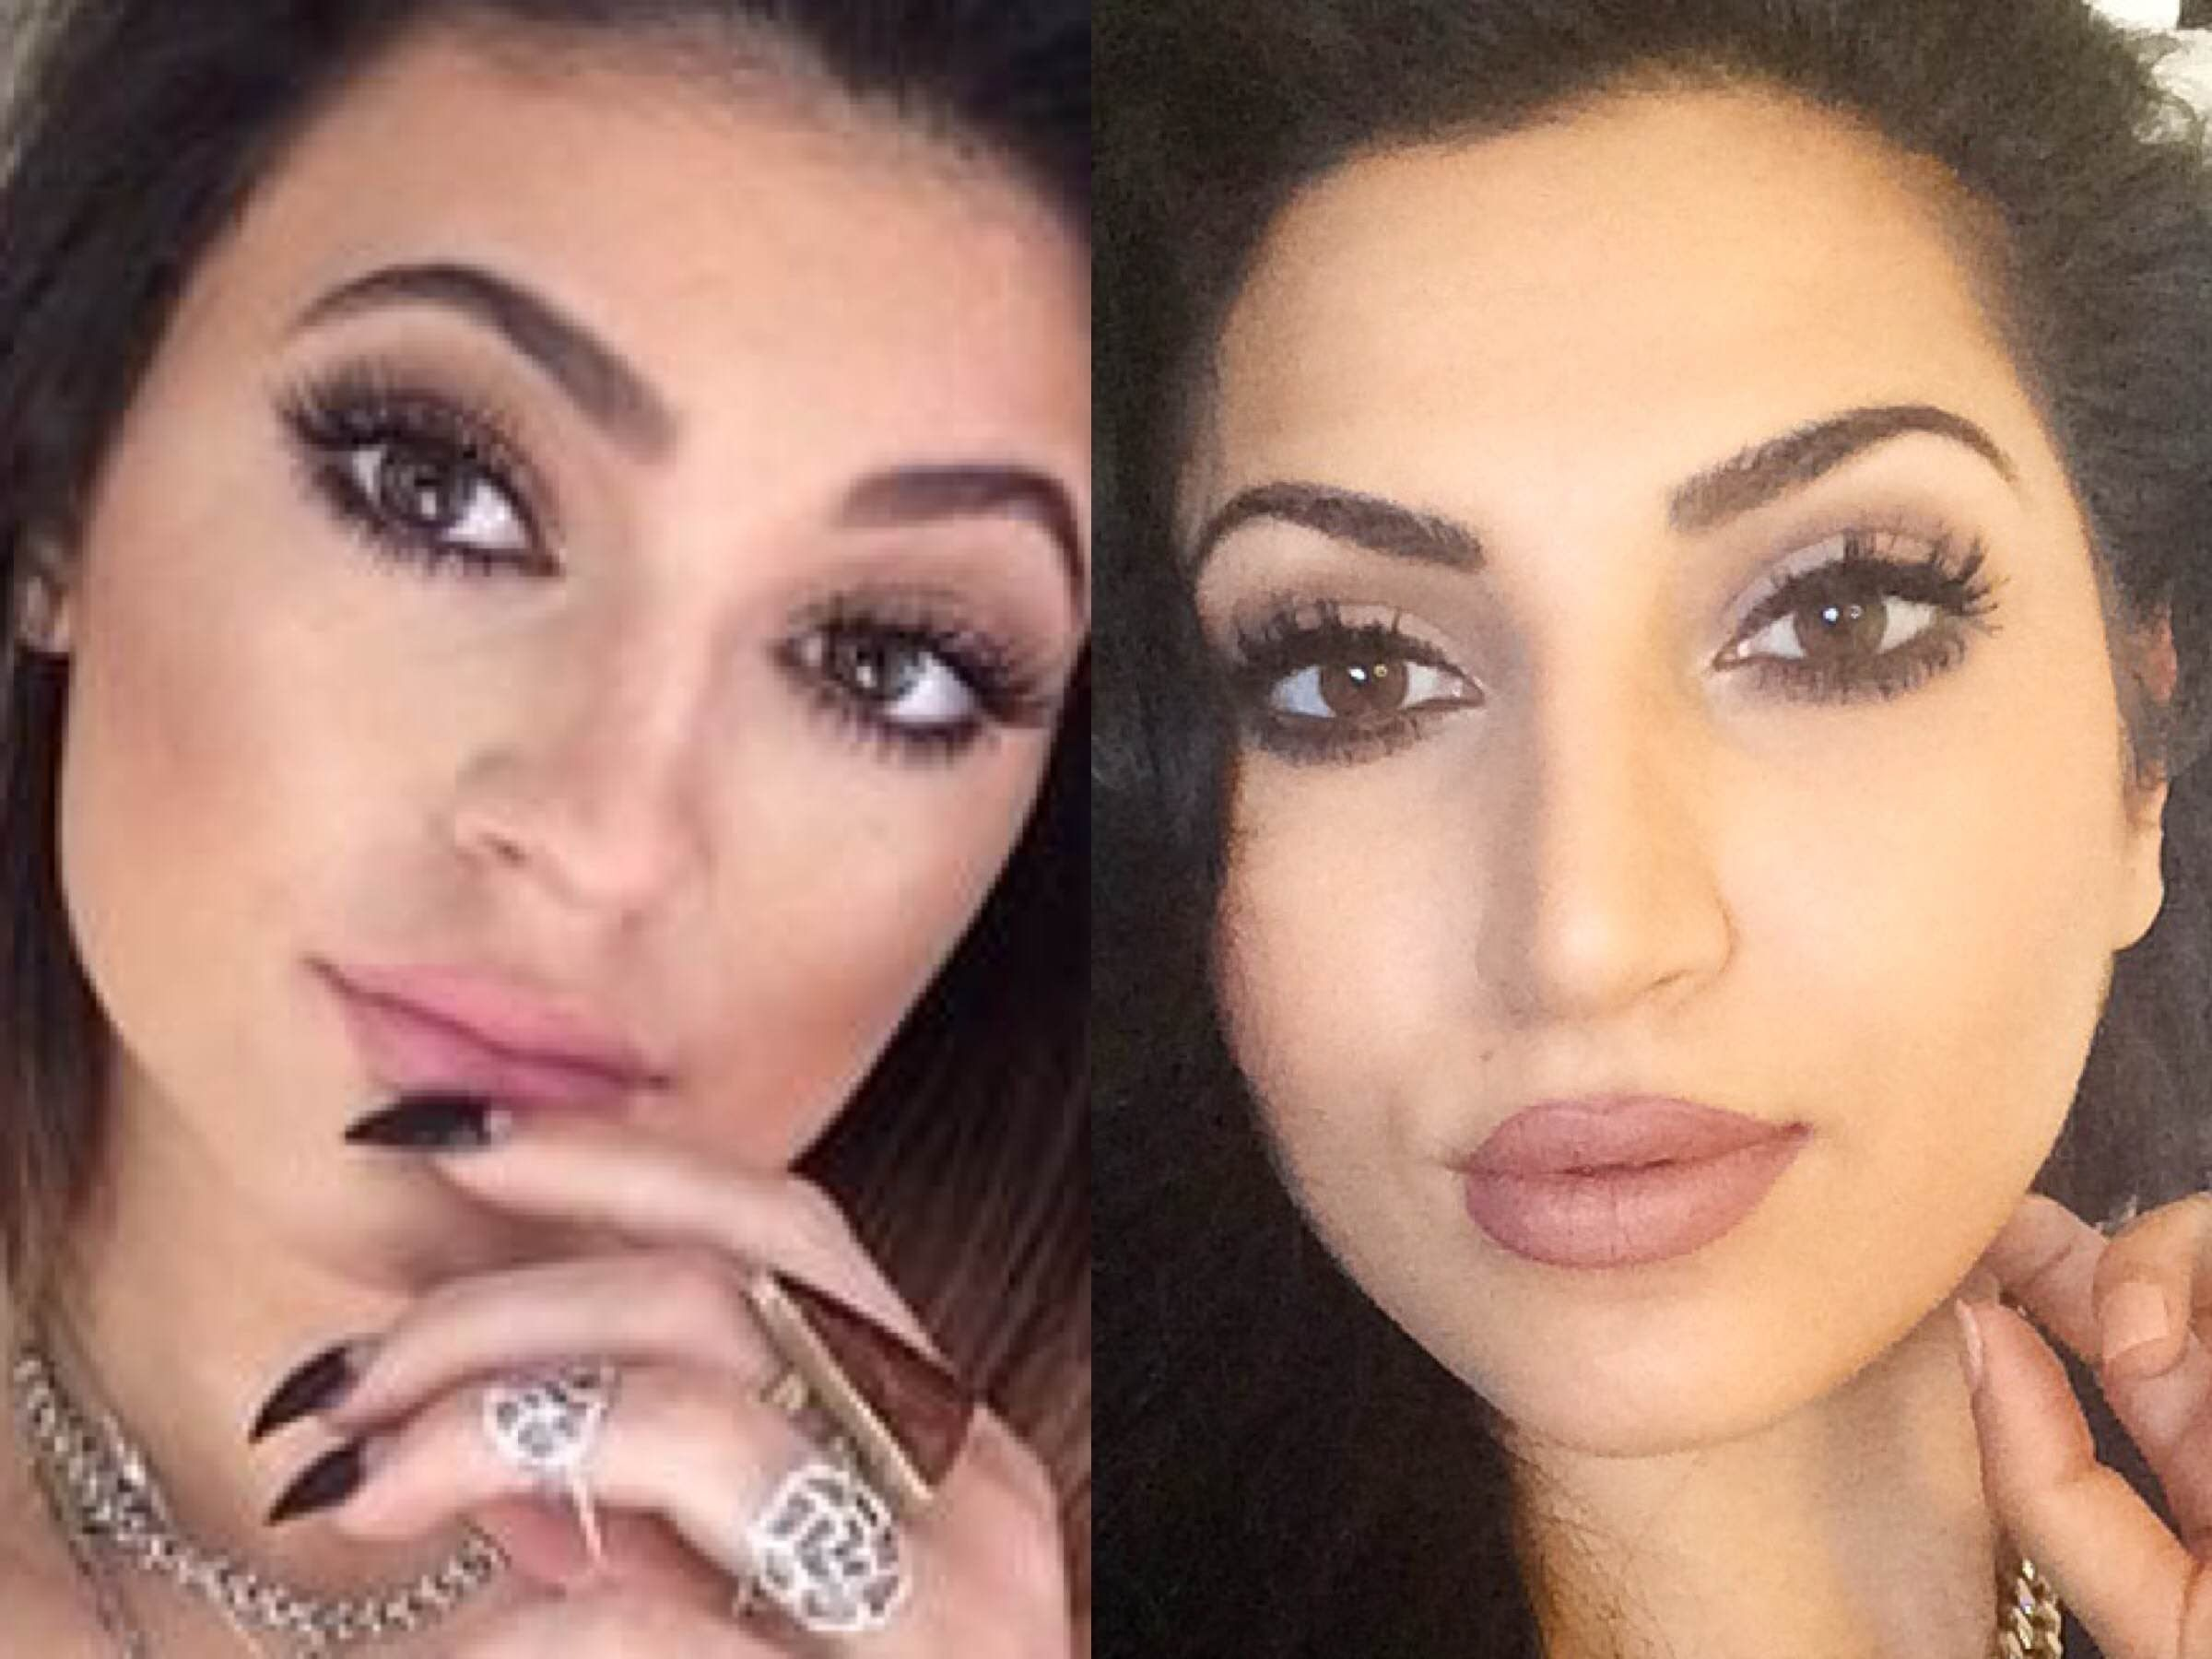 Kylie Jenner Inspired Makeup Tutorial 2014 | Makeup ...